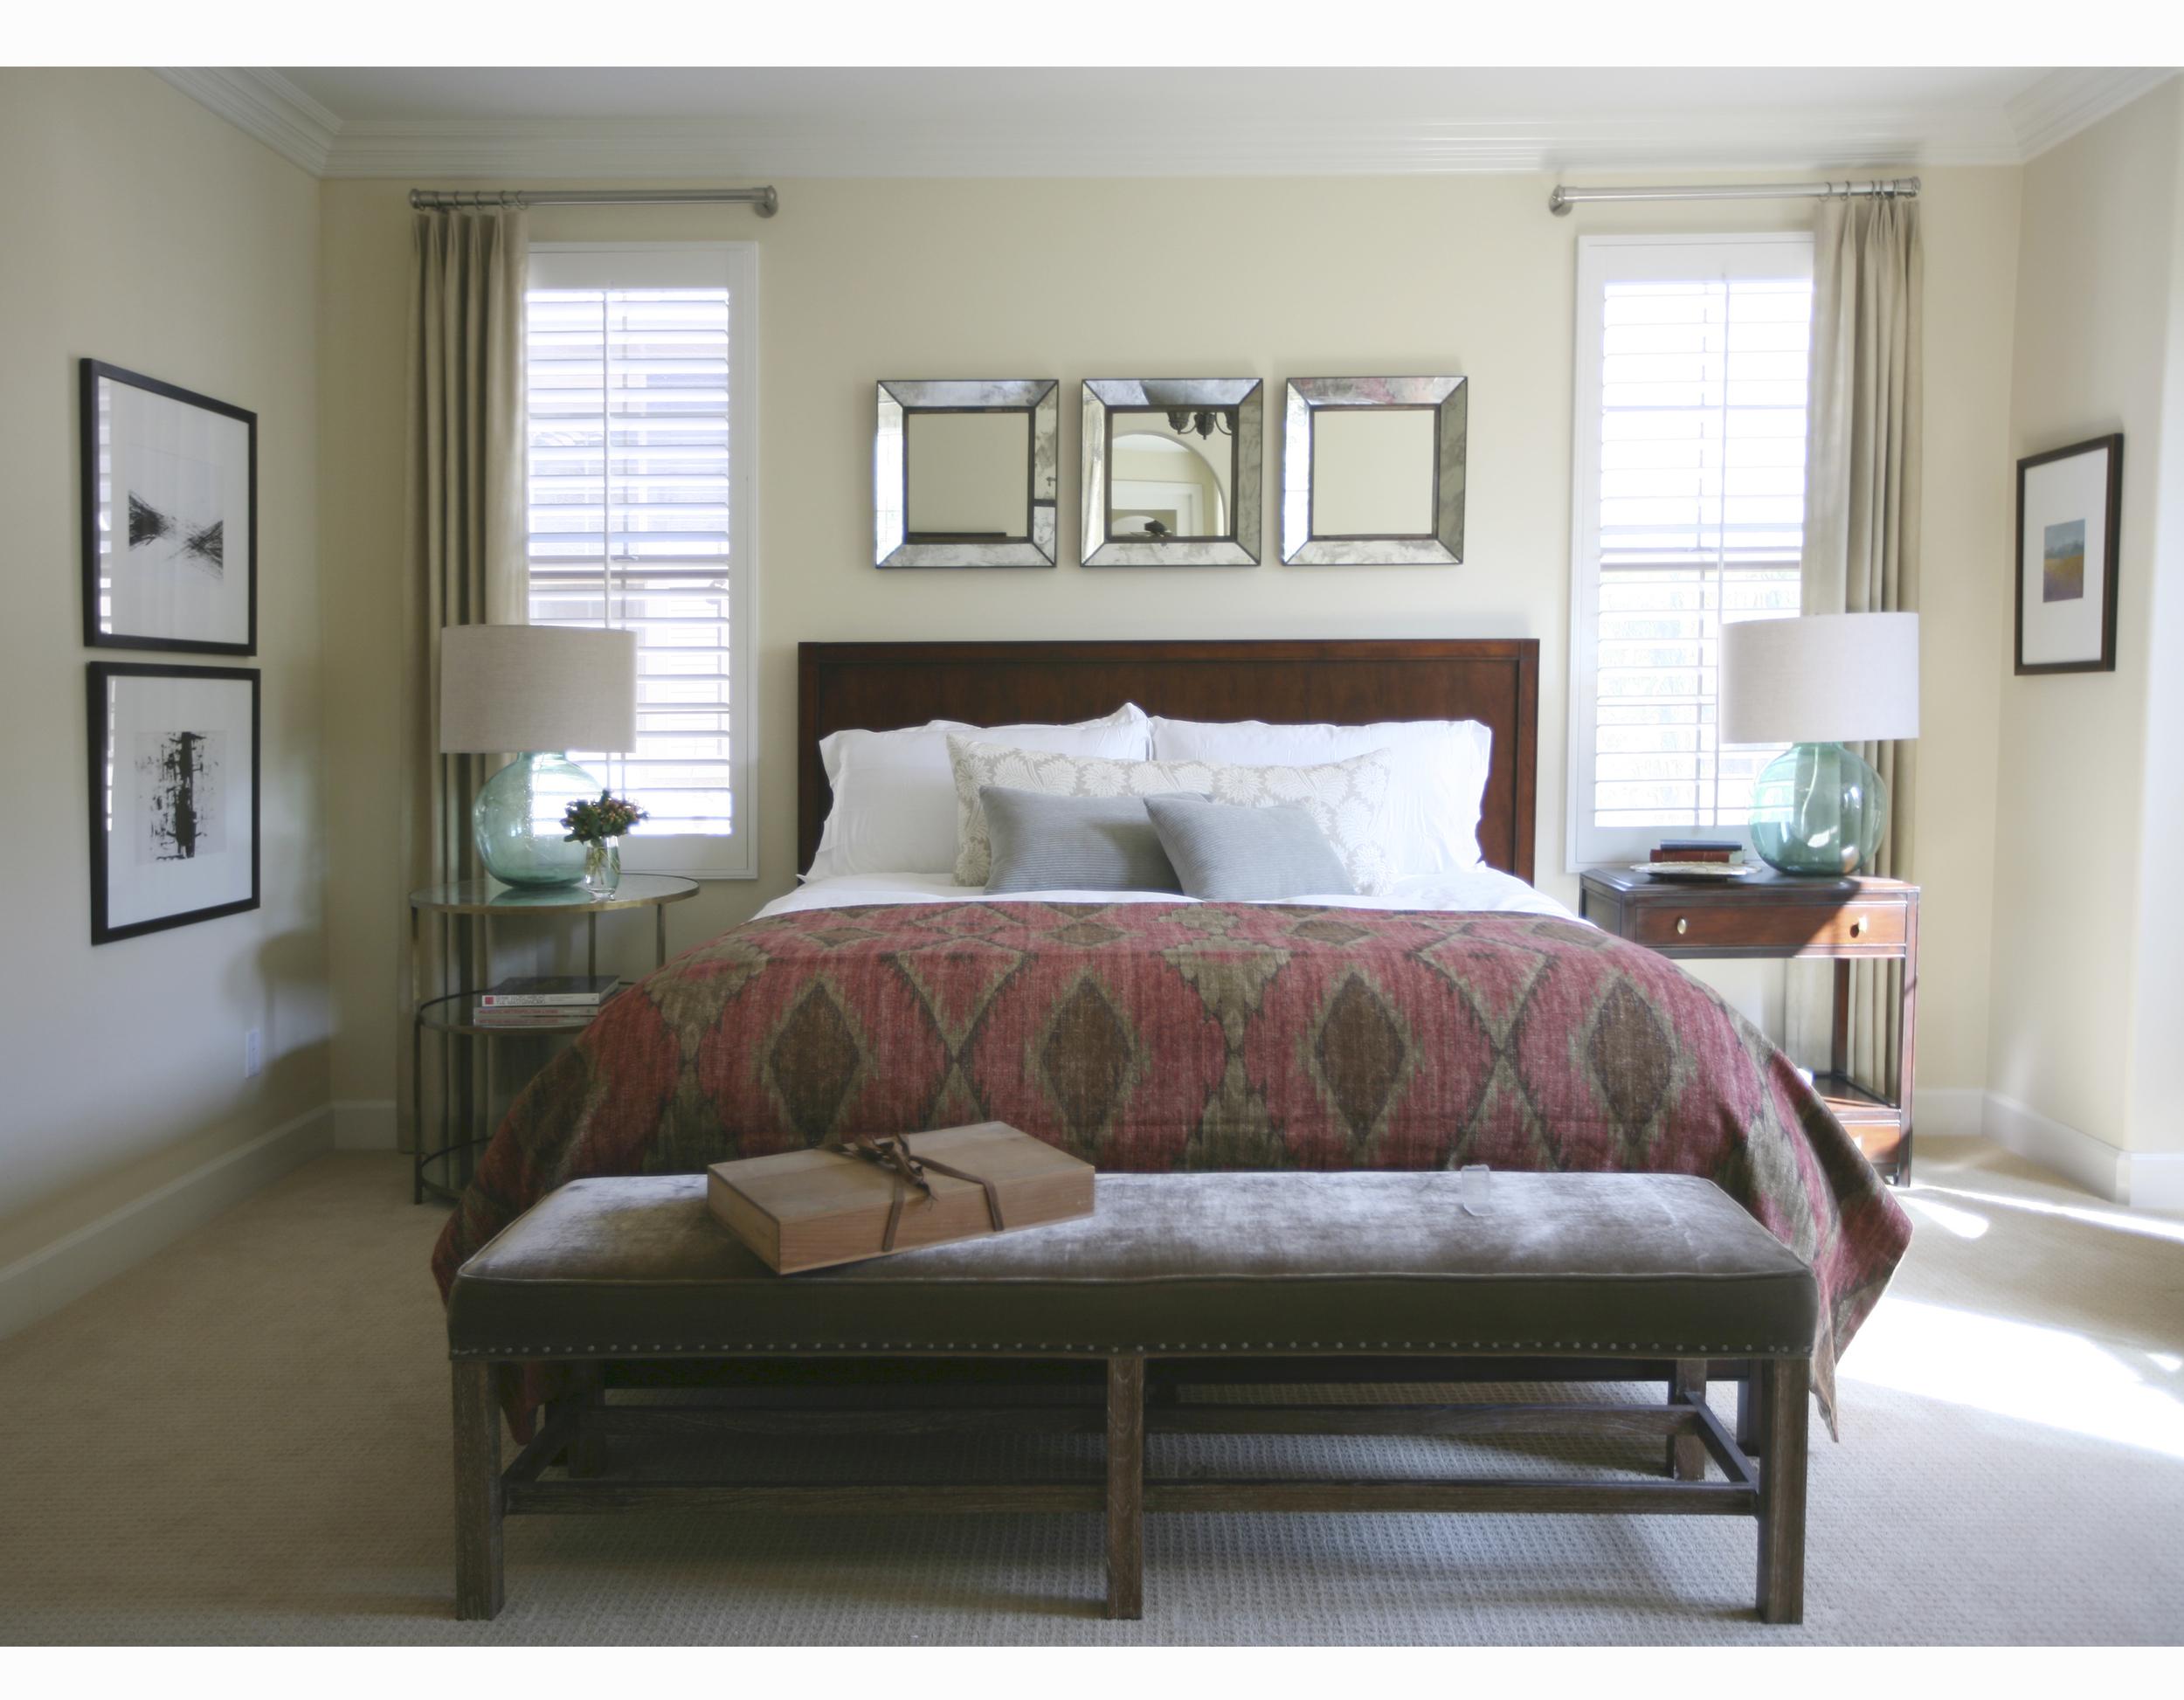 orange county interior designer bedroom design brittany stiles2.jpg